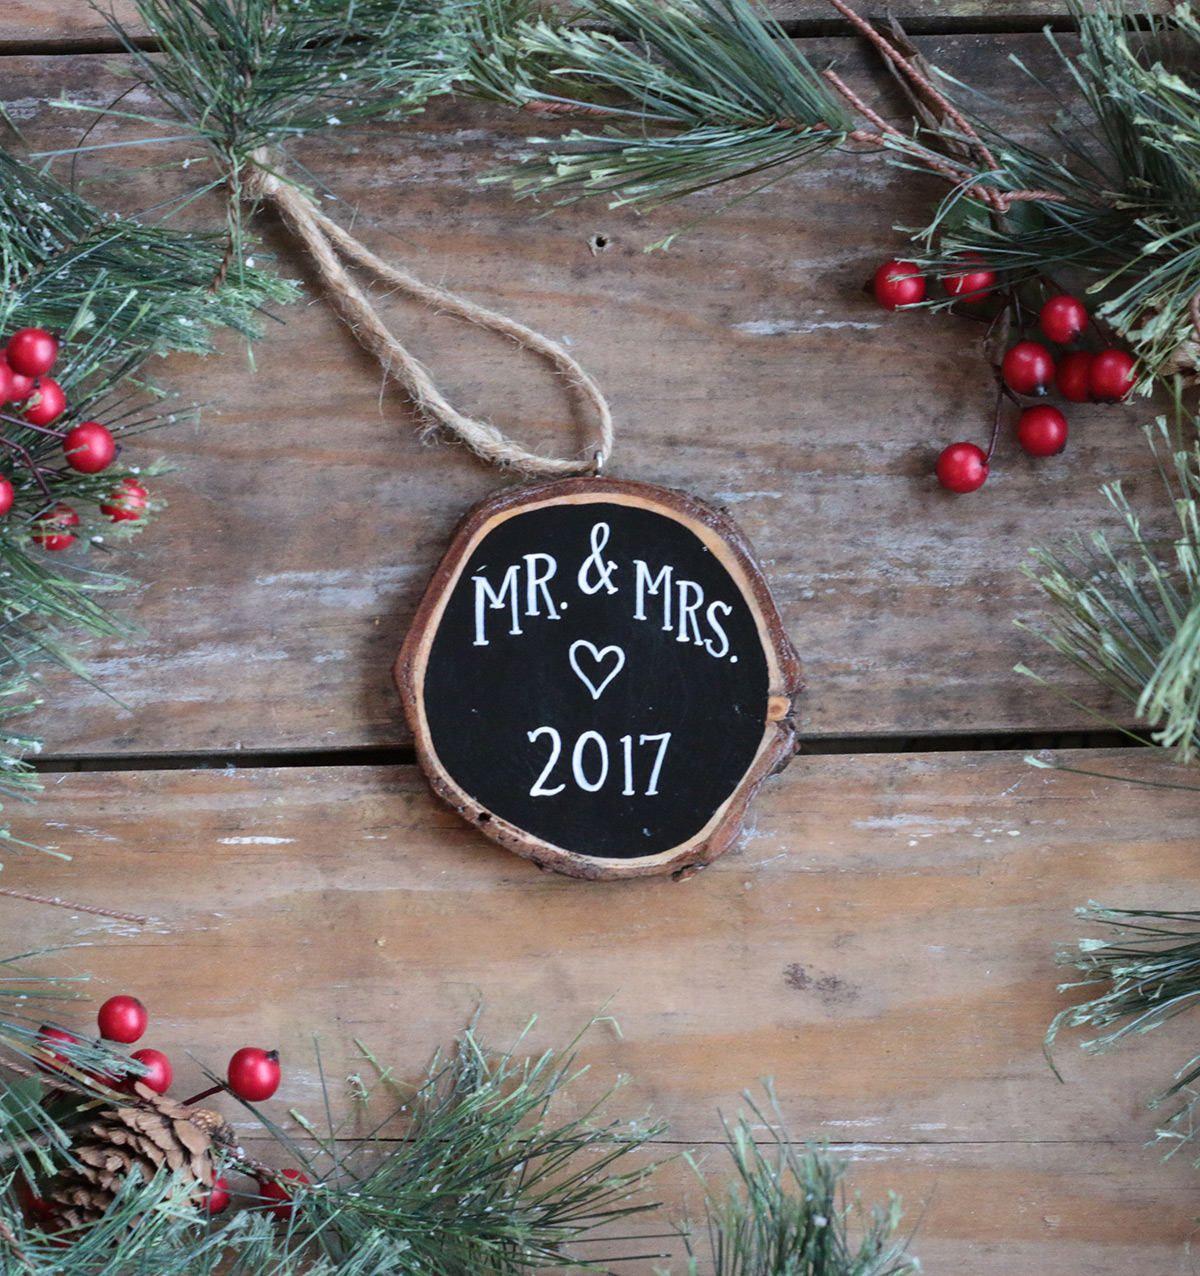 Engaged Christmas Ornament Wood Slice Ornament Christmas Ornament Personalized Wedding couple gift